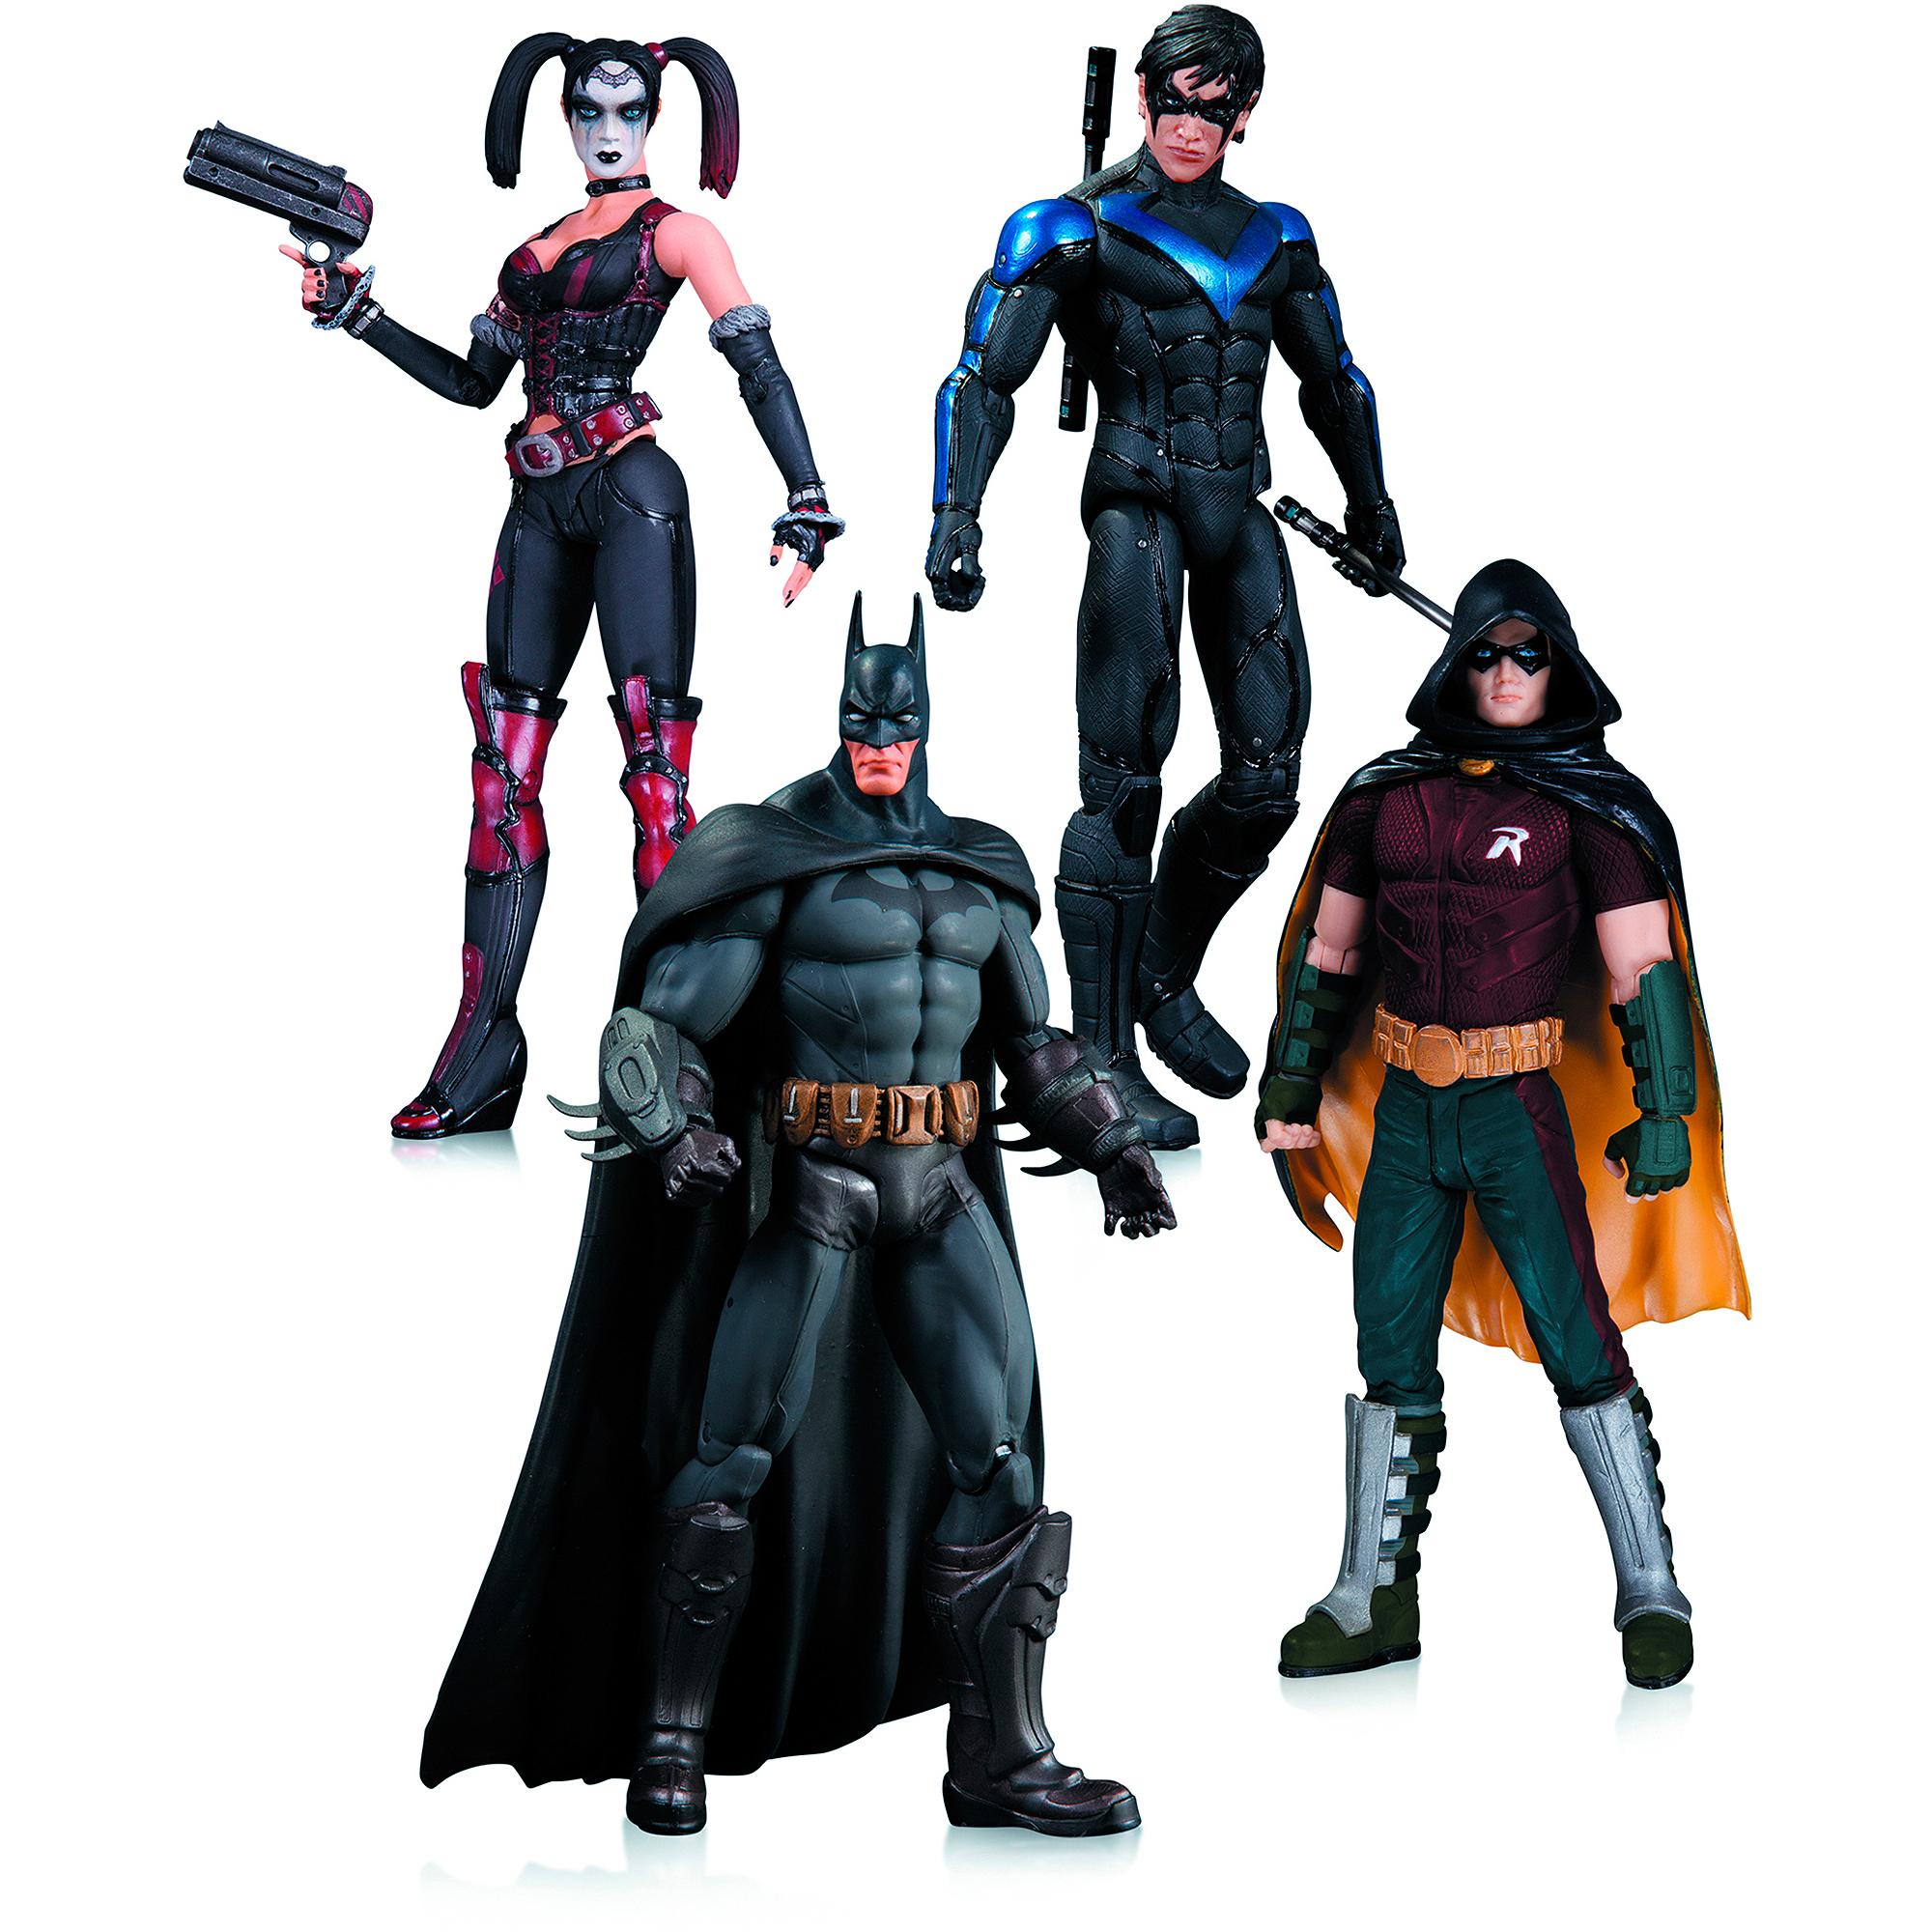 DC Comics Arkham City Action Figure Box Set, Harley Quinn, Batman, Nightwing and Robin